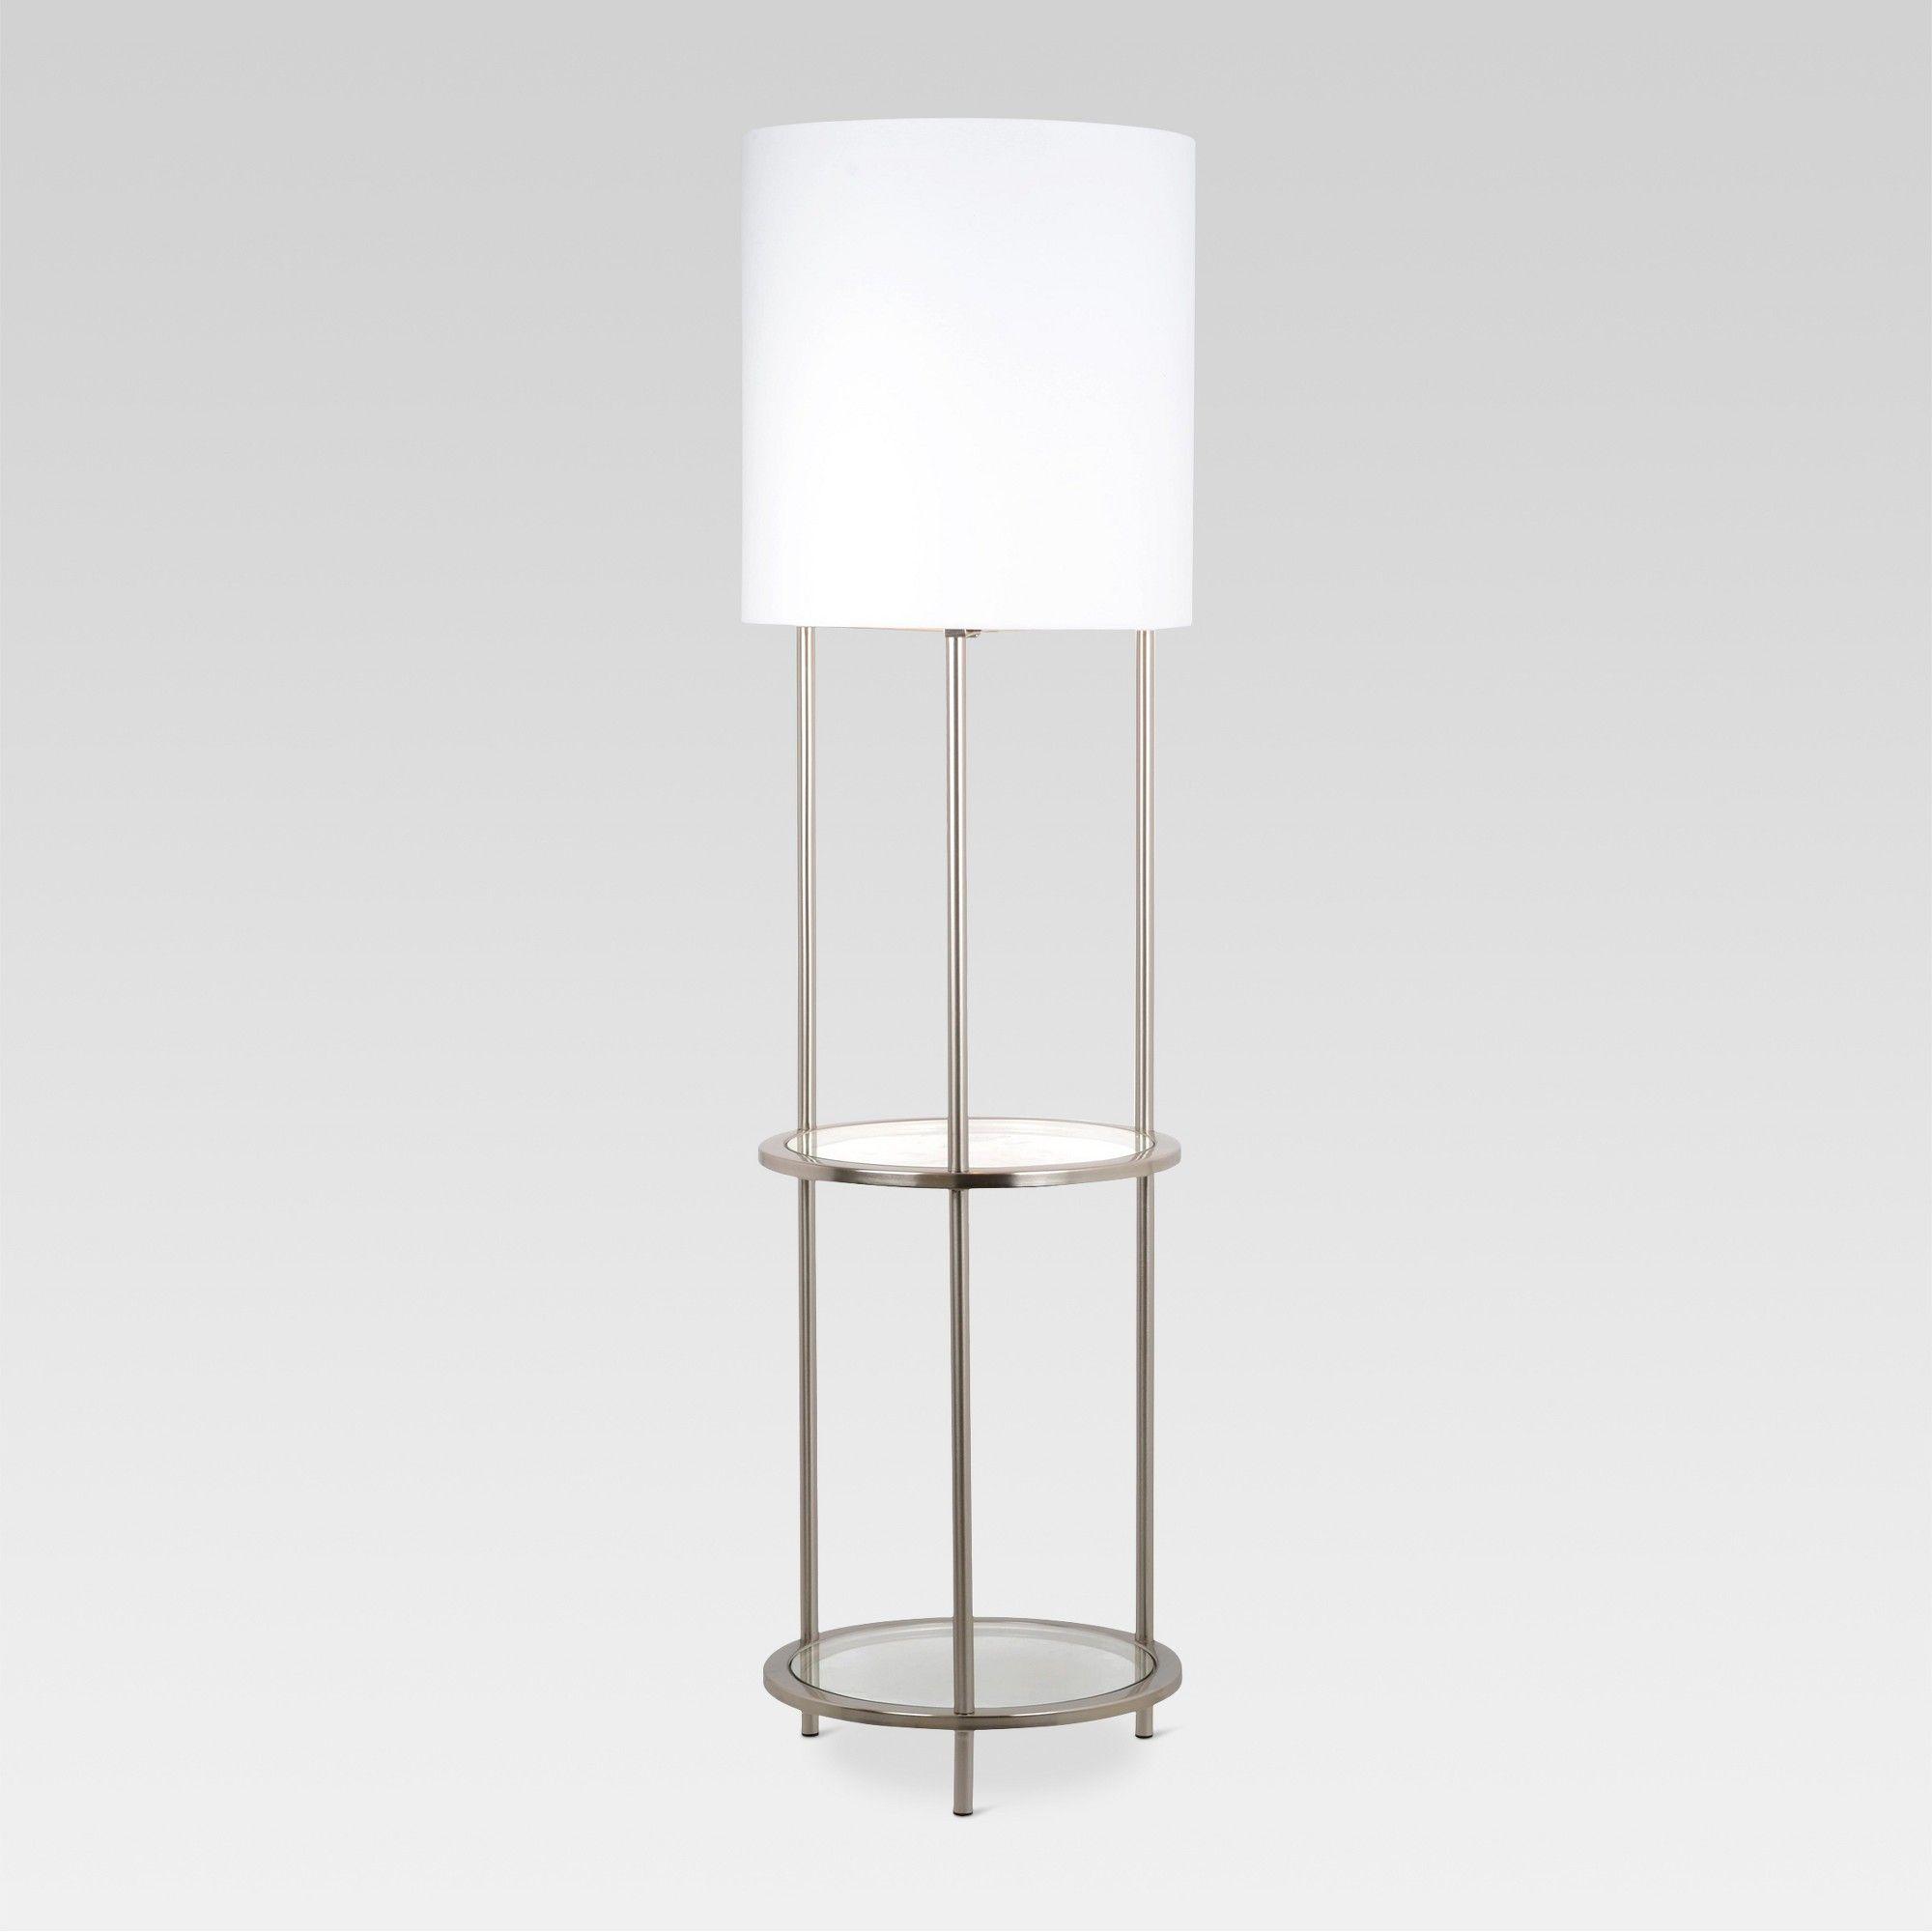 Glass Shelf Floor Lamp Silver Includes Energy Efficient